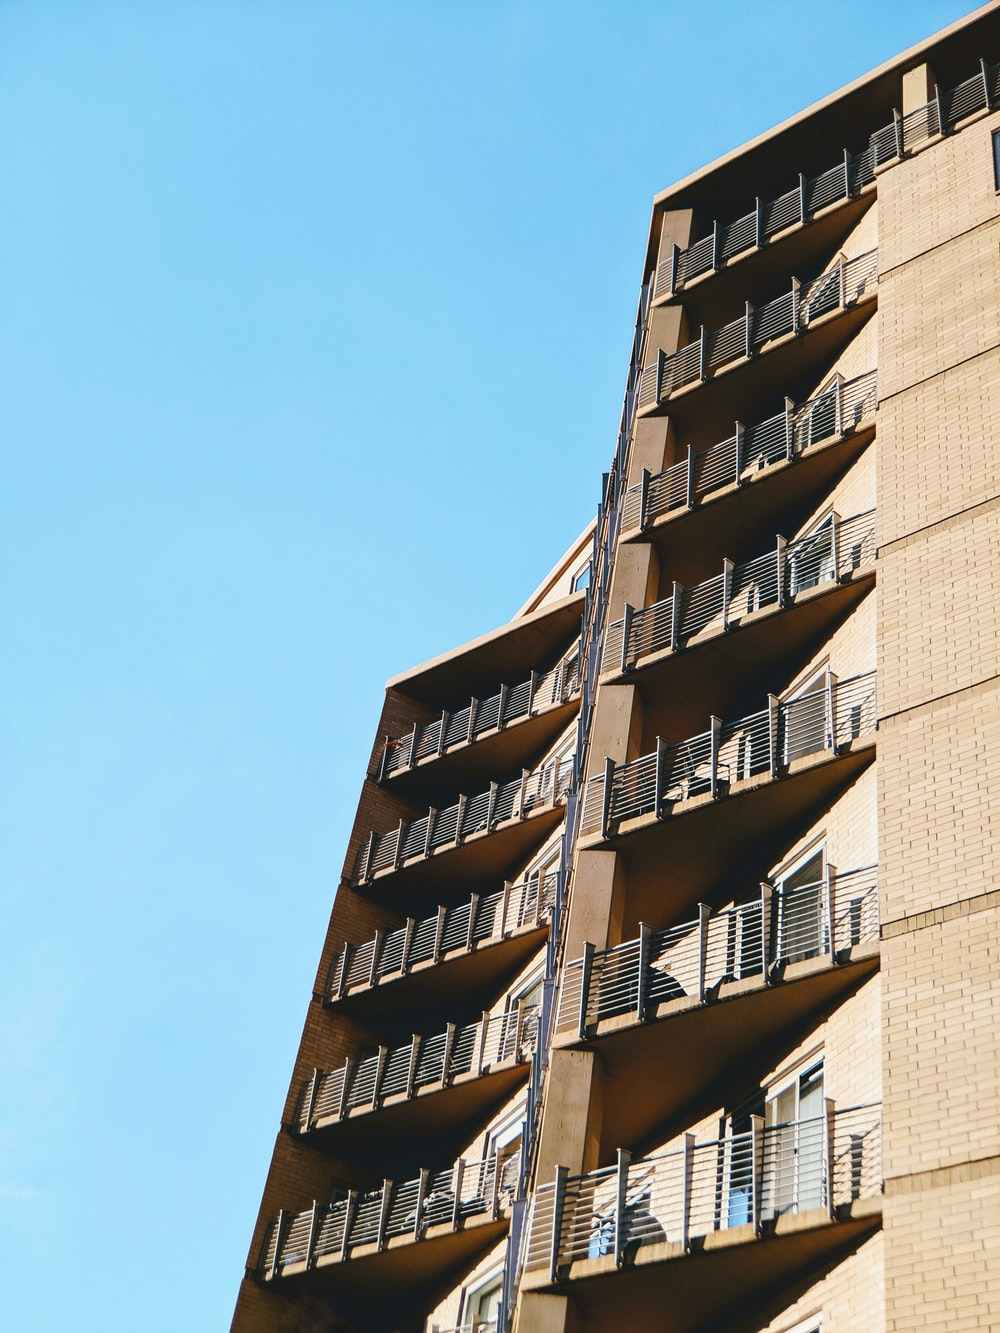 beige concrete building at daytime